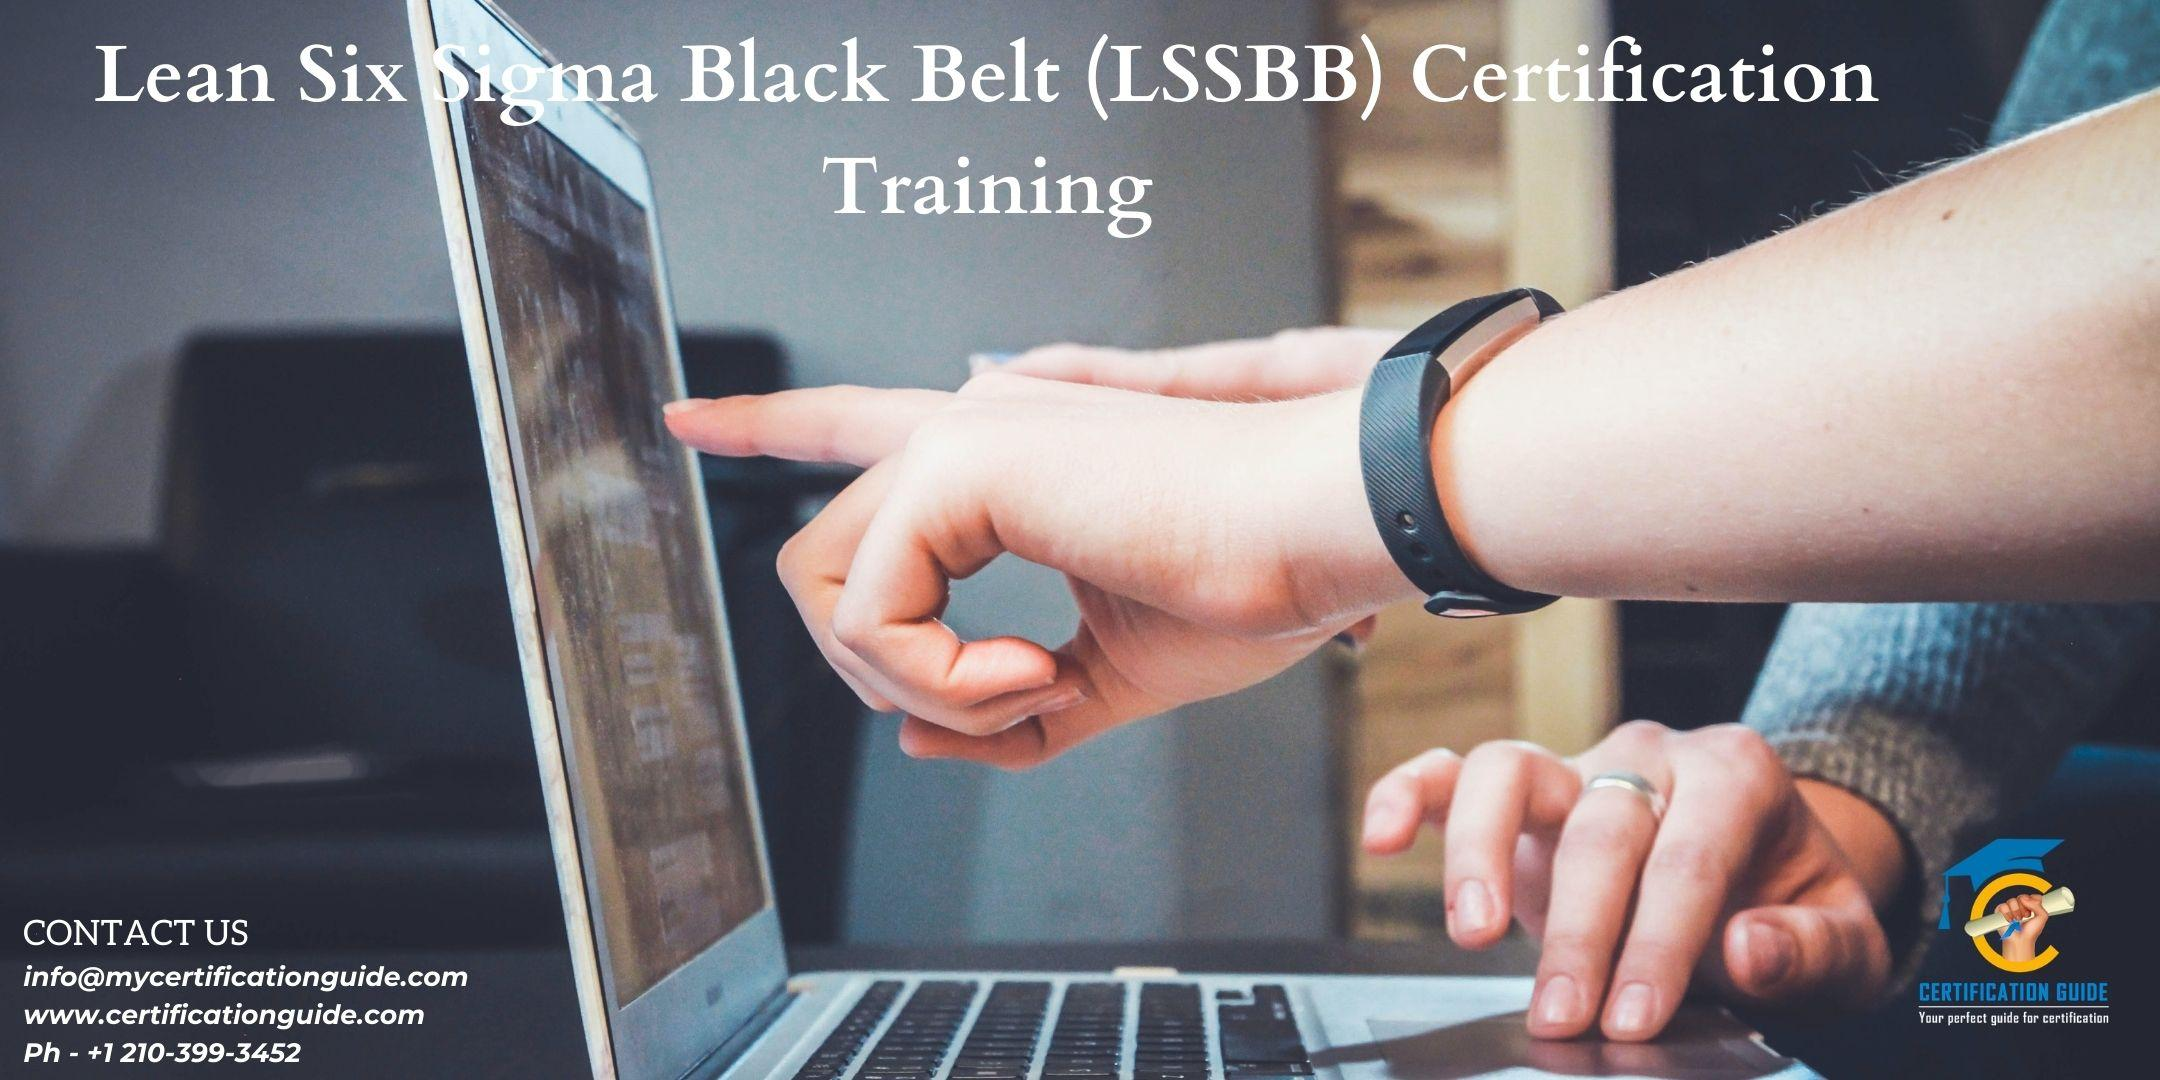 Lean Six Sigma Black Belt Certification Training in Calgary, AB